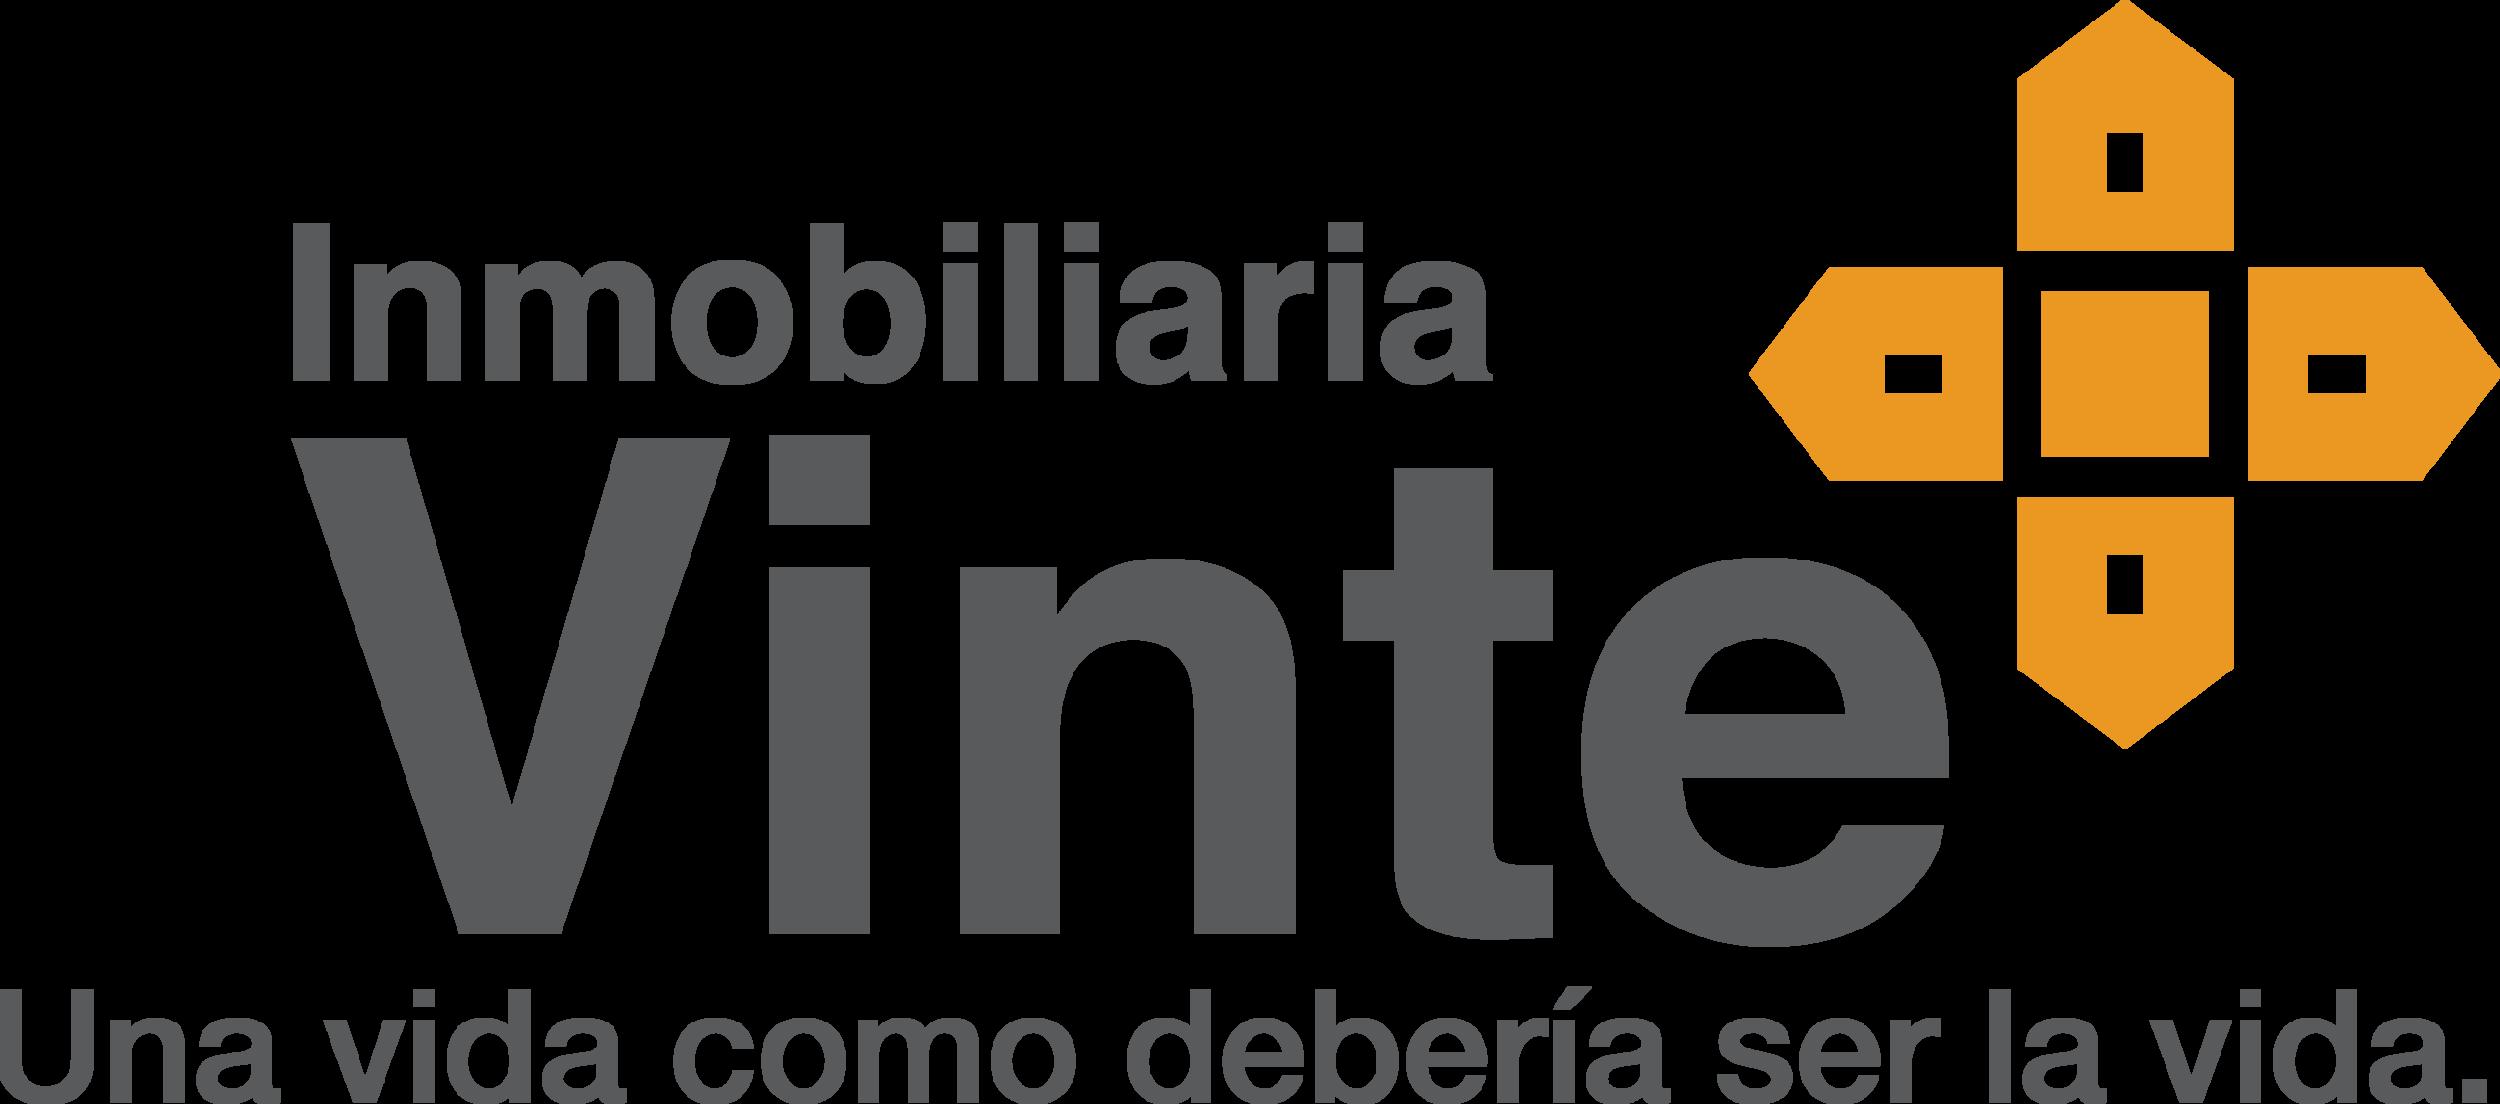 01_Logo_Vinte_2015.png